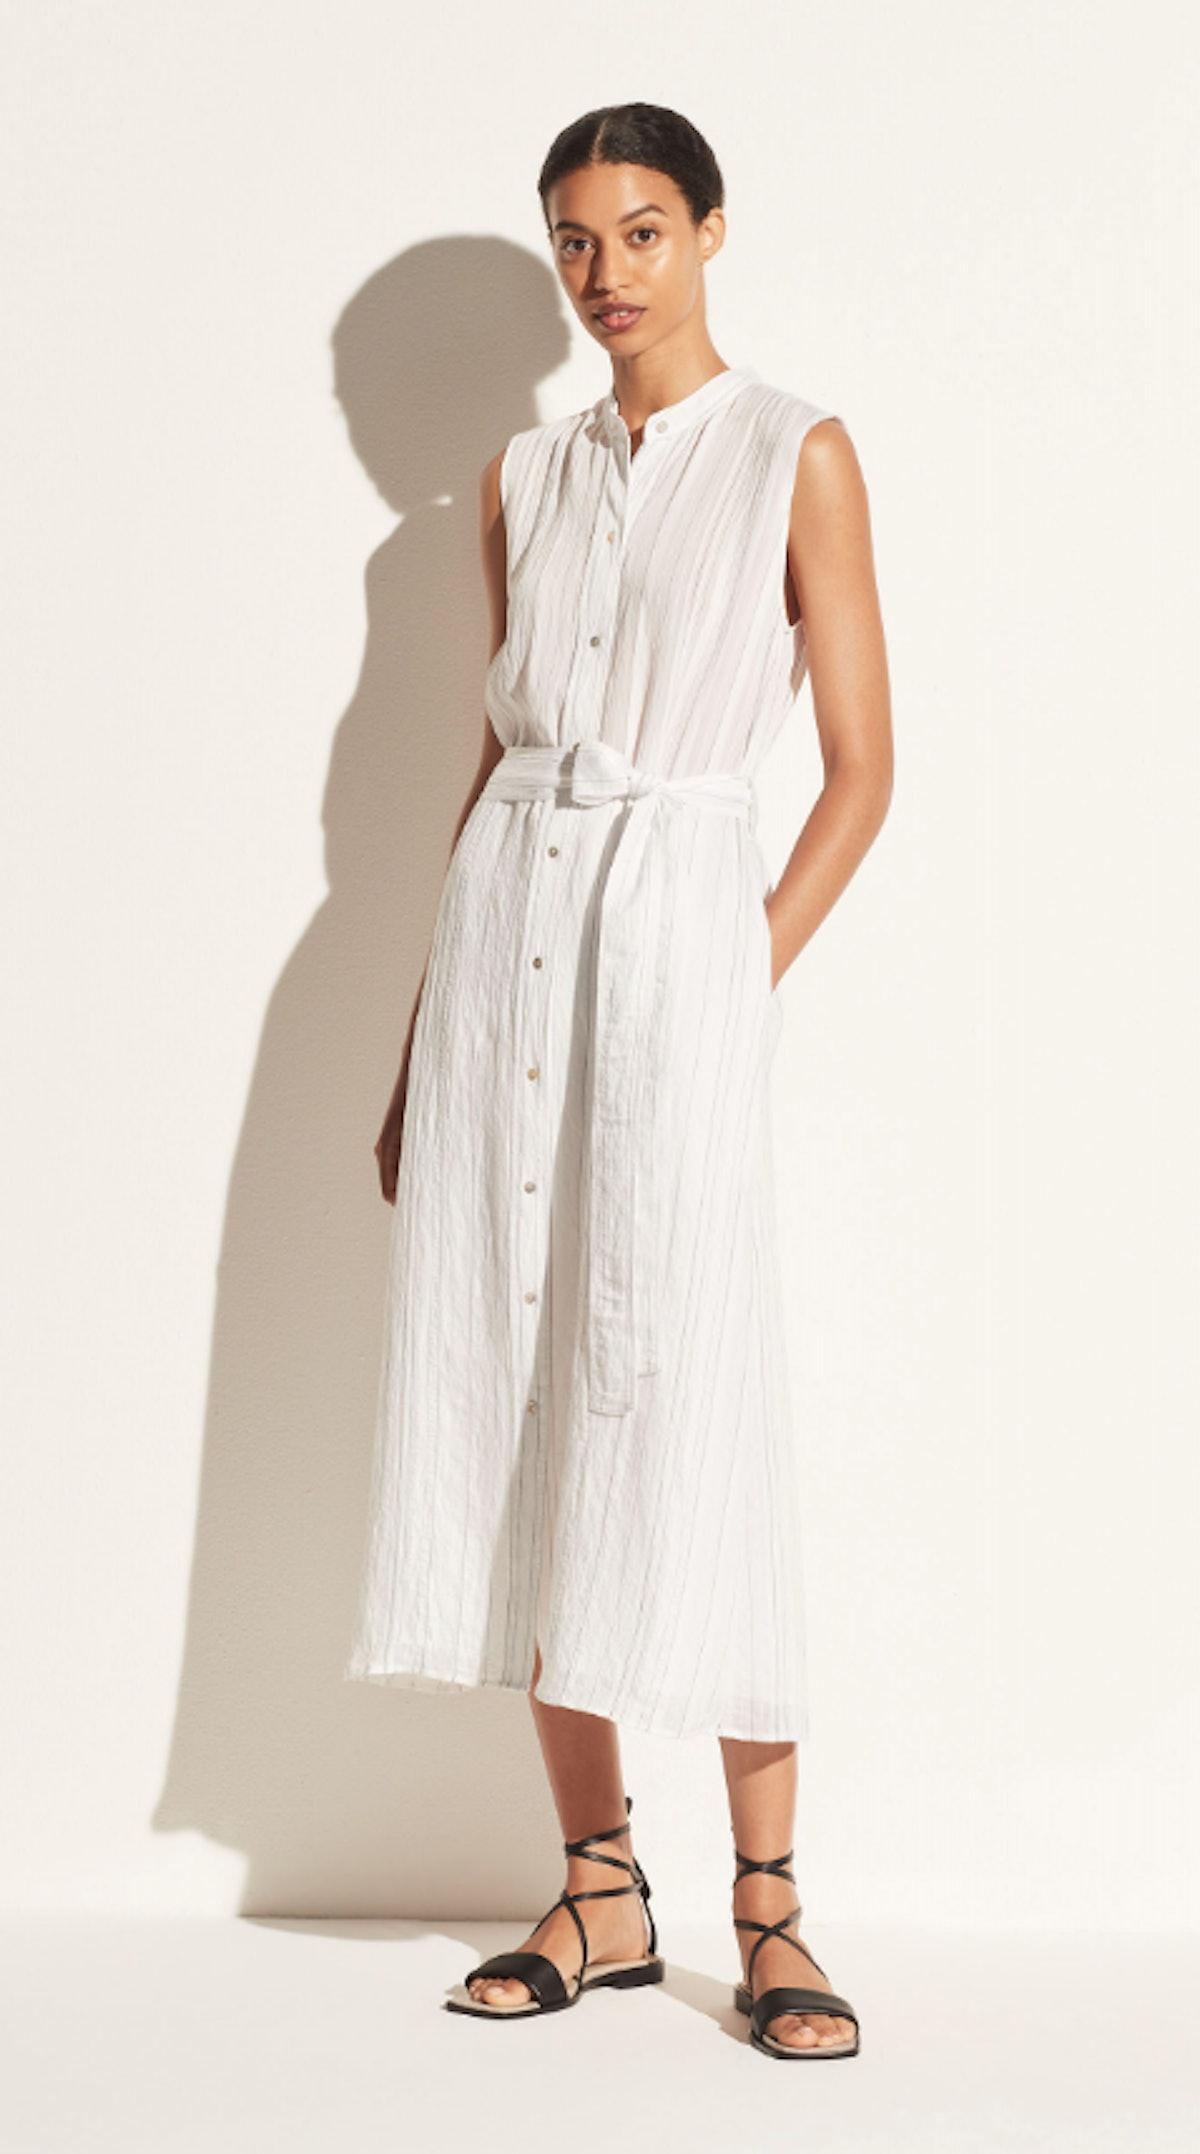 VINCE's white stripe shirt dress.